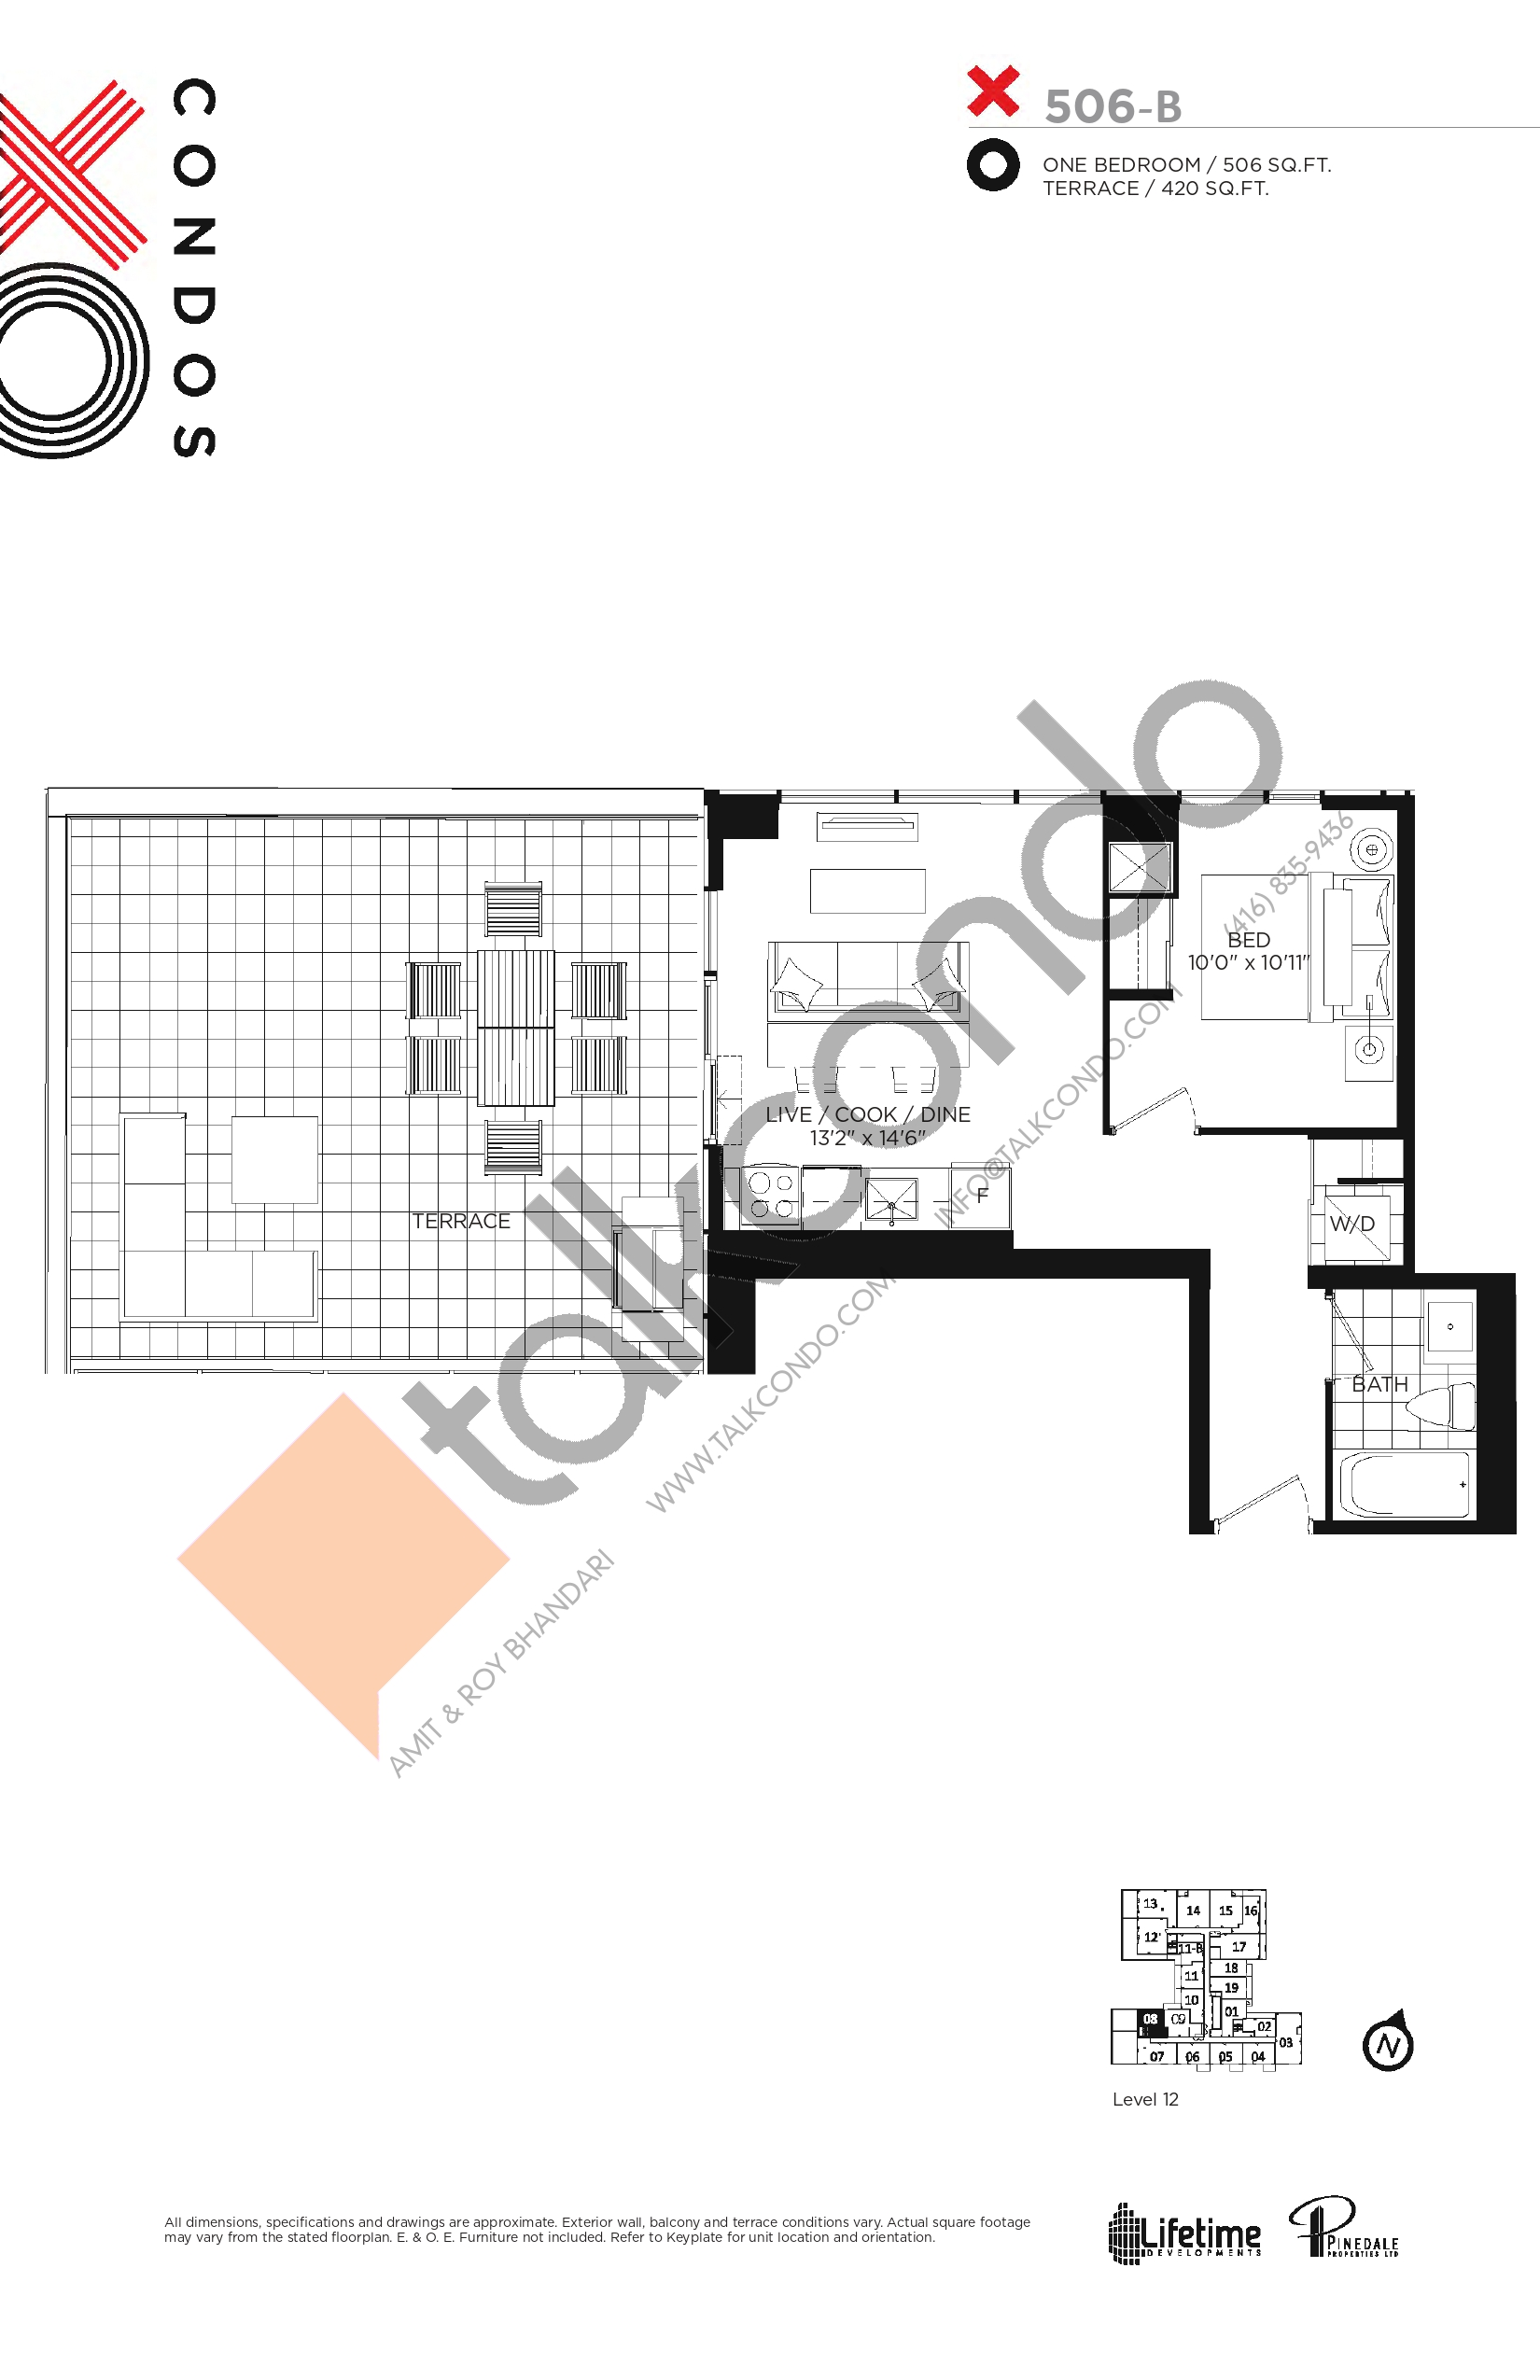 X506-B Floor Plan at XO Condos - 506 sq.ft